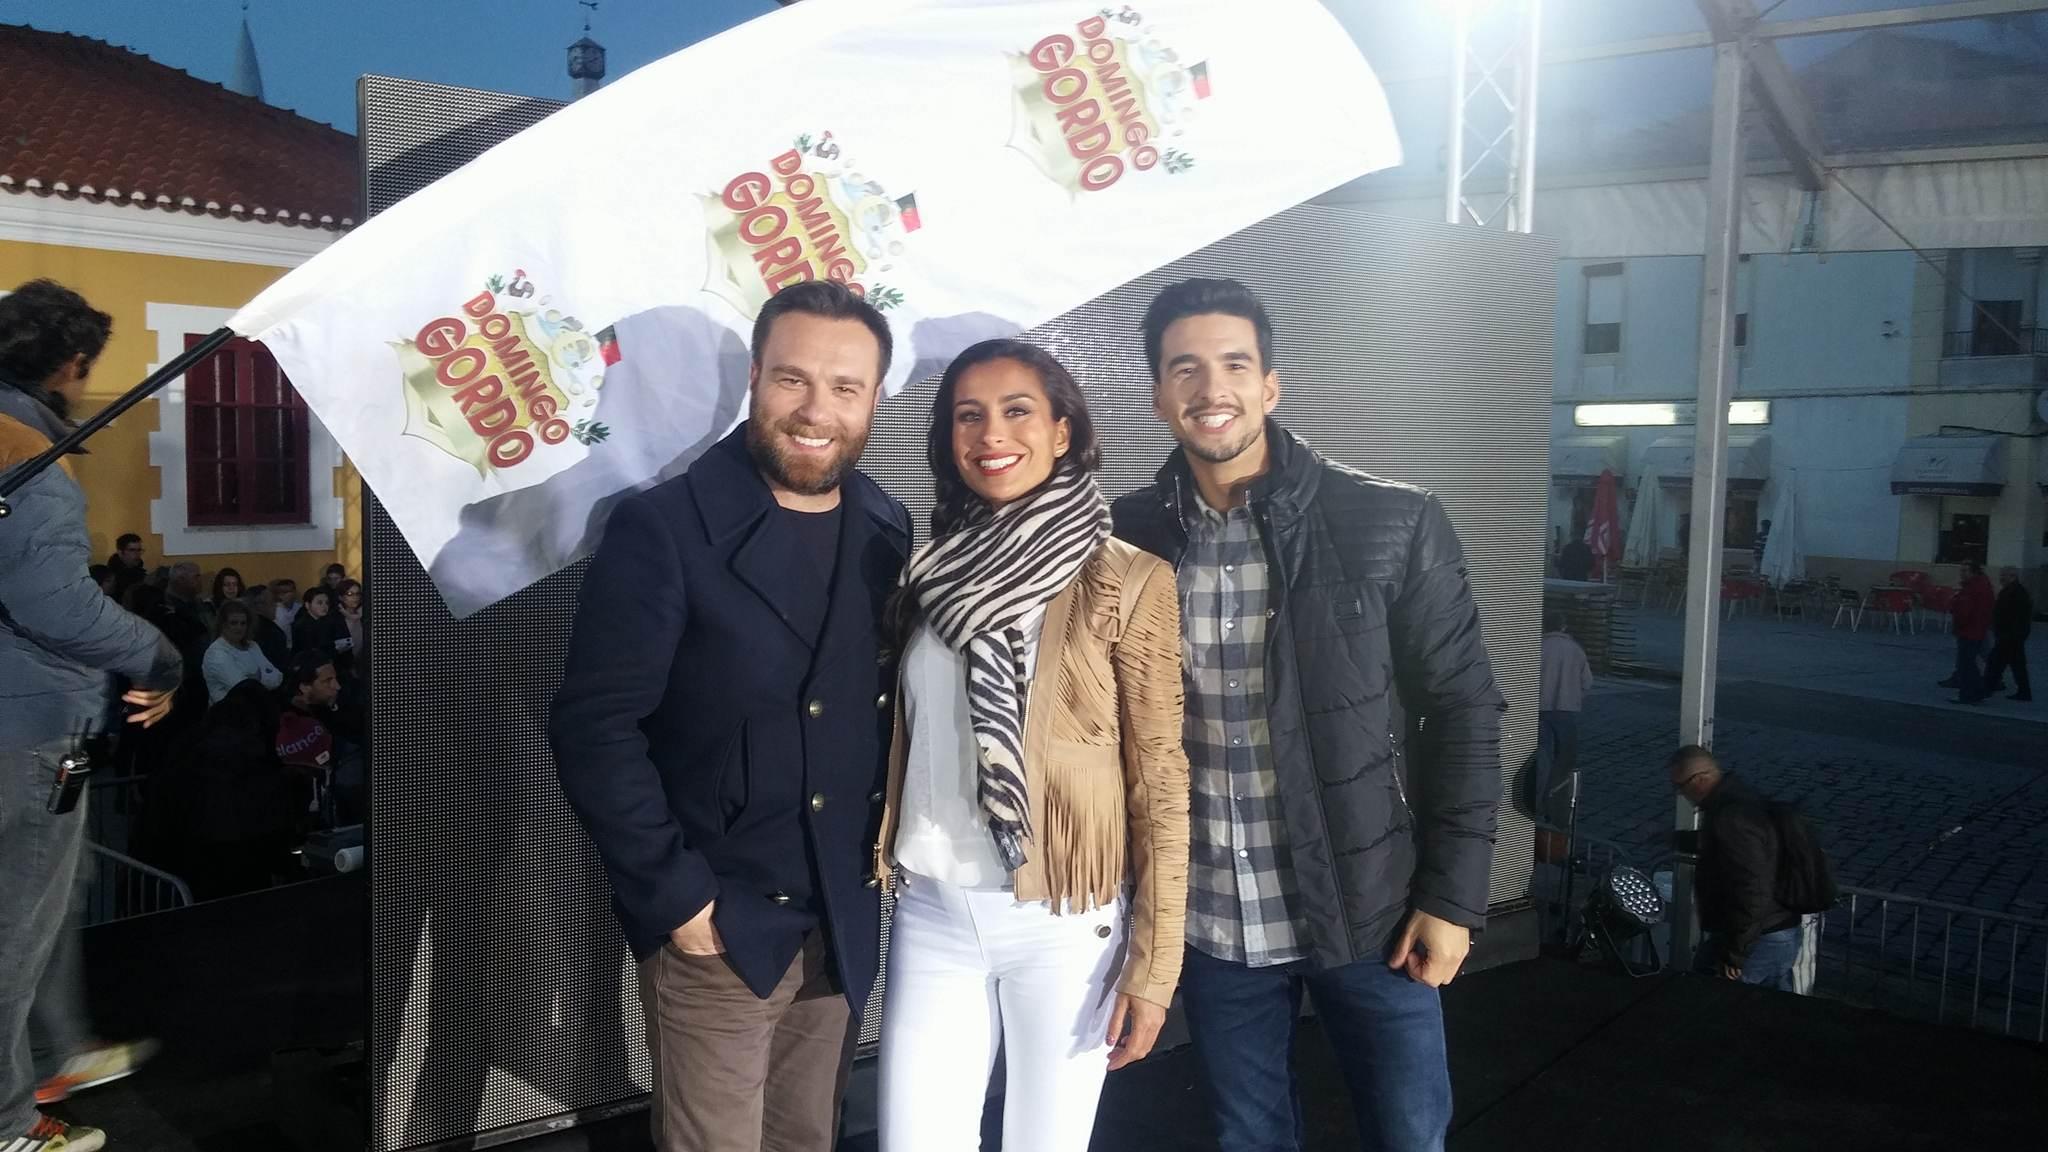 Somos Portugal A Entrevista - Nuno Eiró E Mónica Jardim